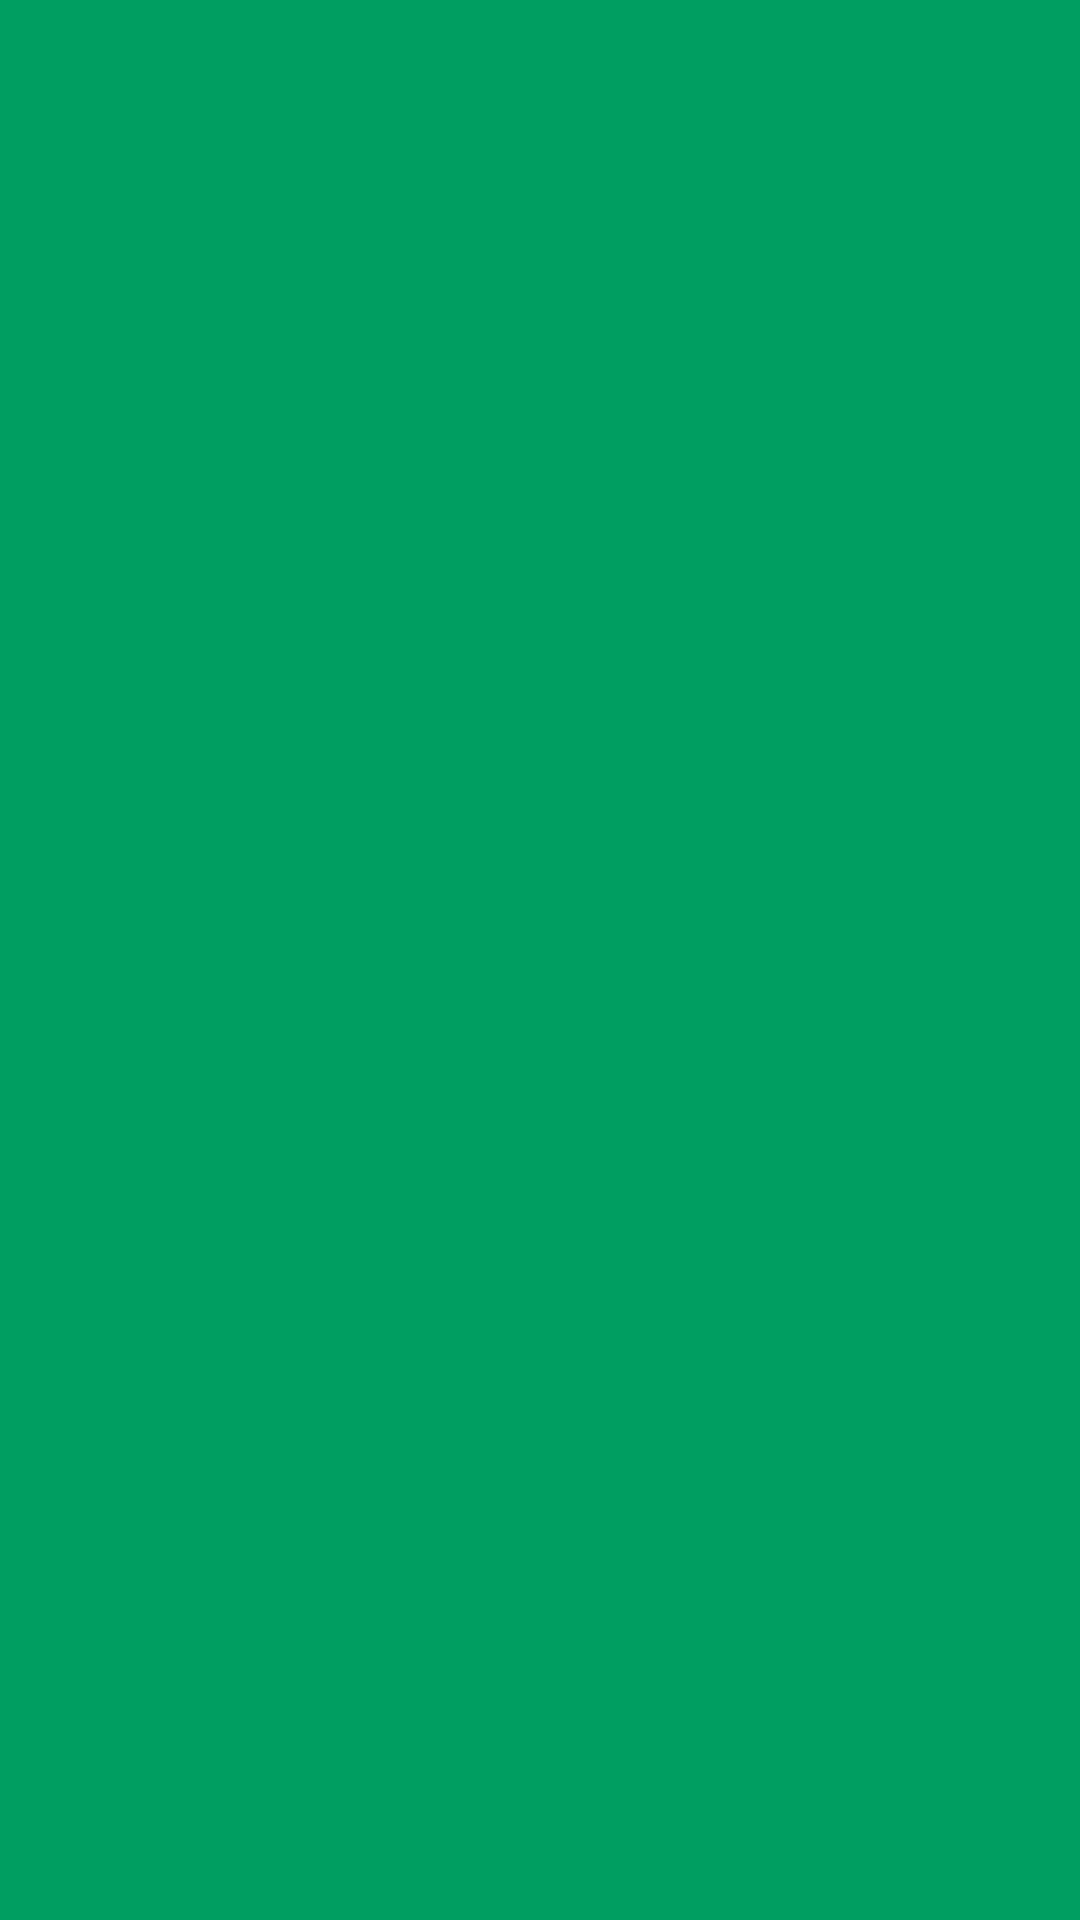 1080x1920 Shamrock Green Solid Color Background